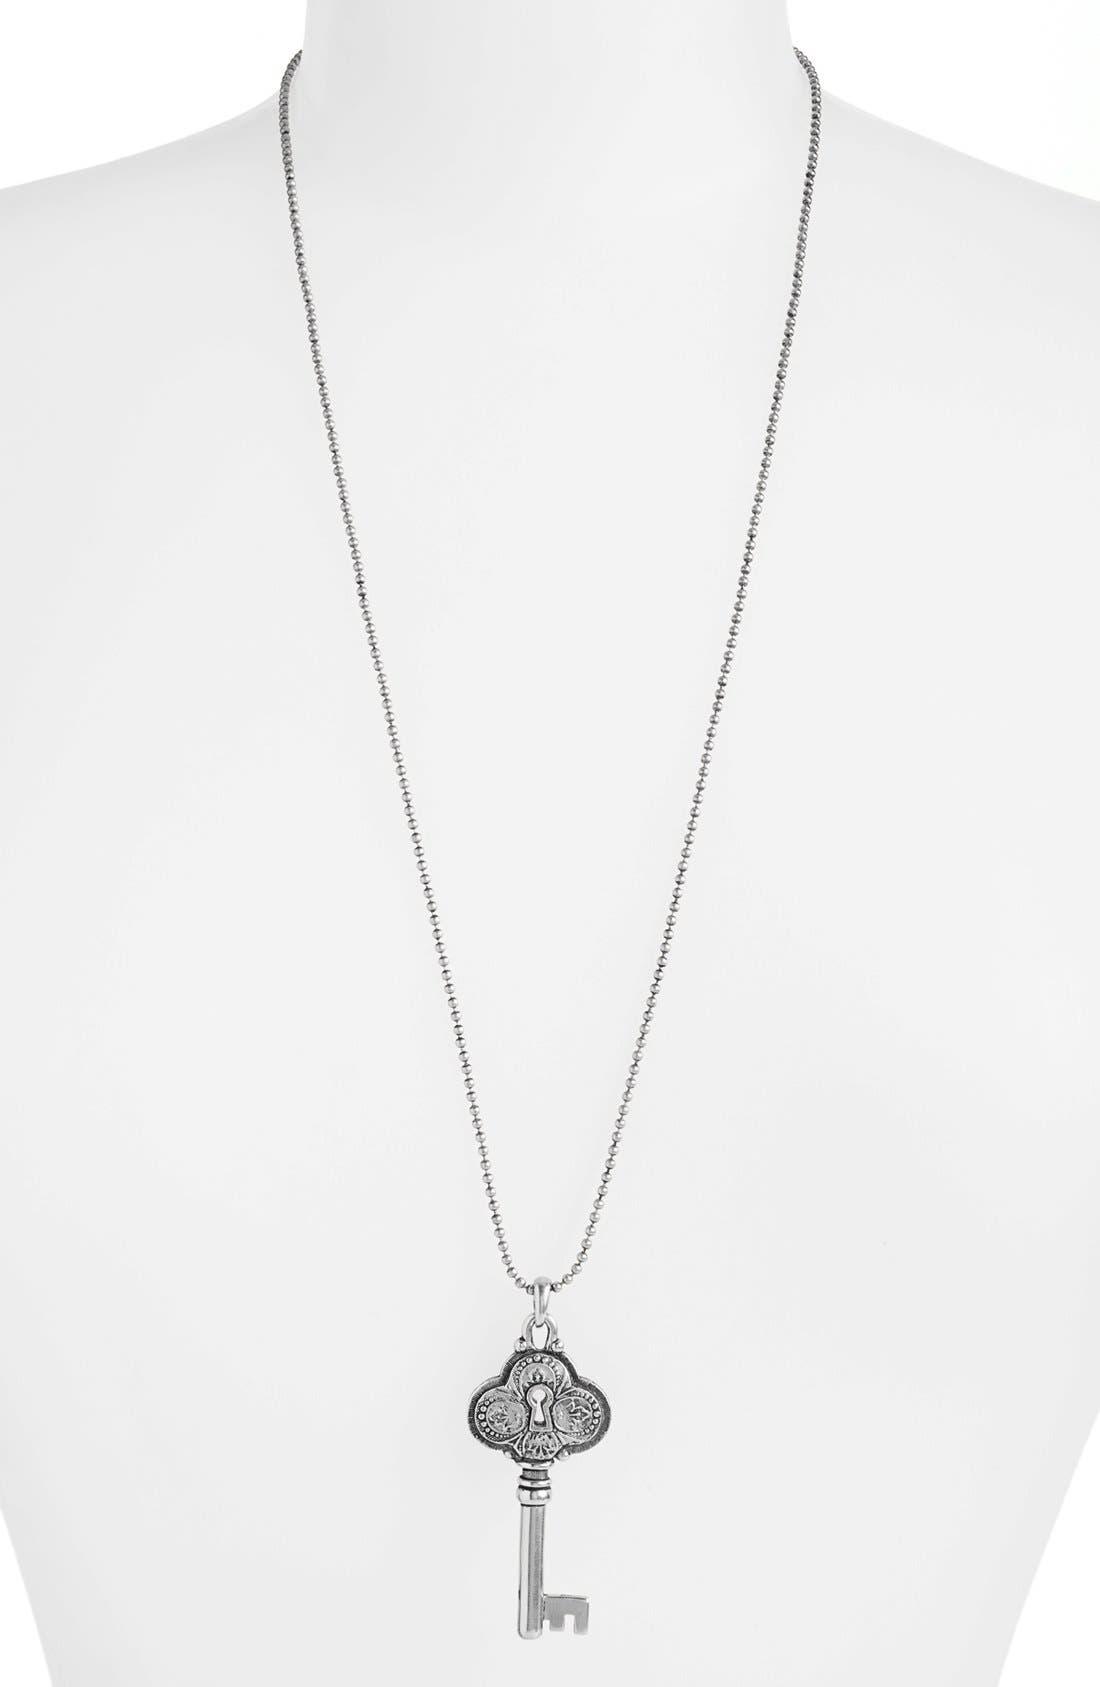 Alternate Image 1 Selected - Nordstrom 'Antique' Pendant Necklace